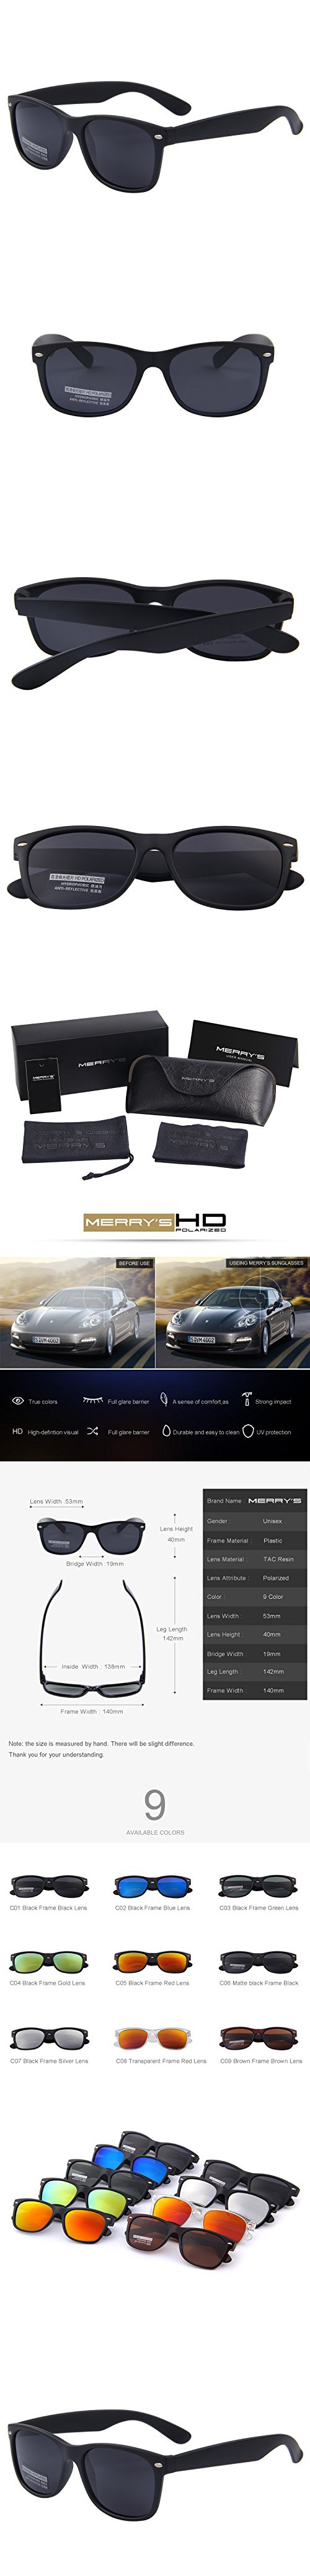 f094164916 MERRY S Retro Rewind Classic Polarized Wayfarer Sunglasses S683  (MatteBlack